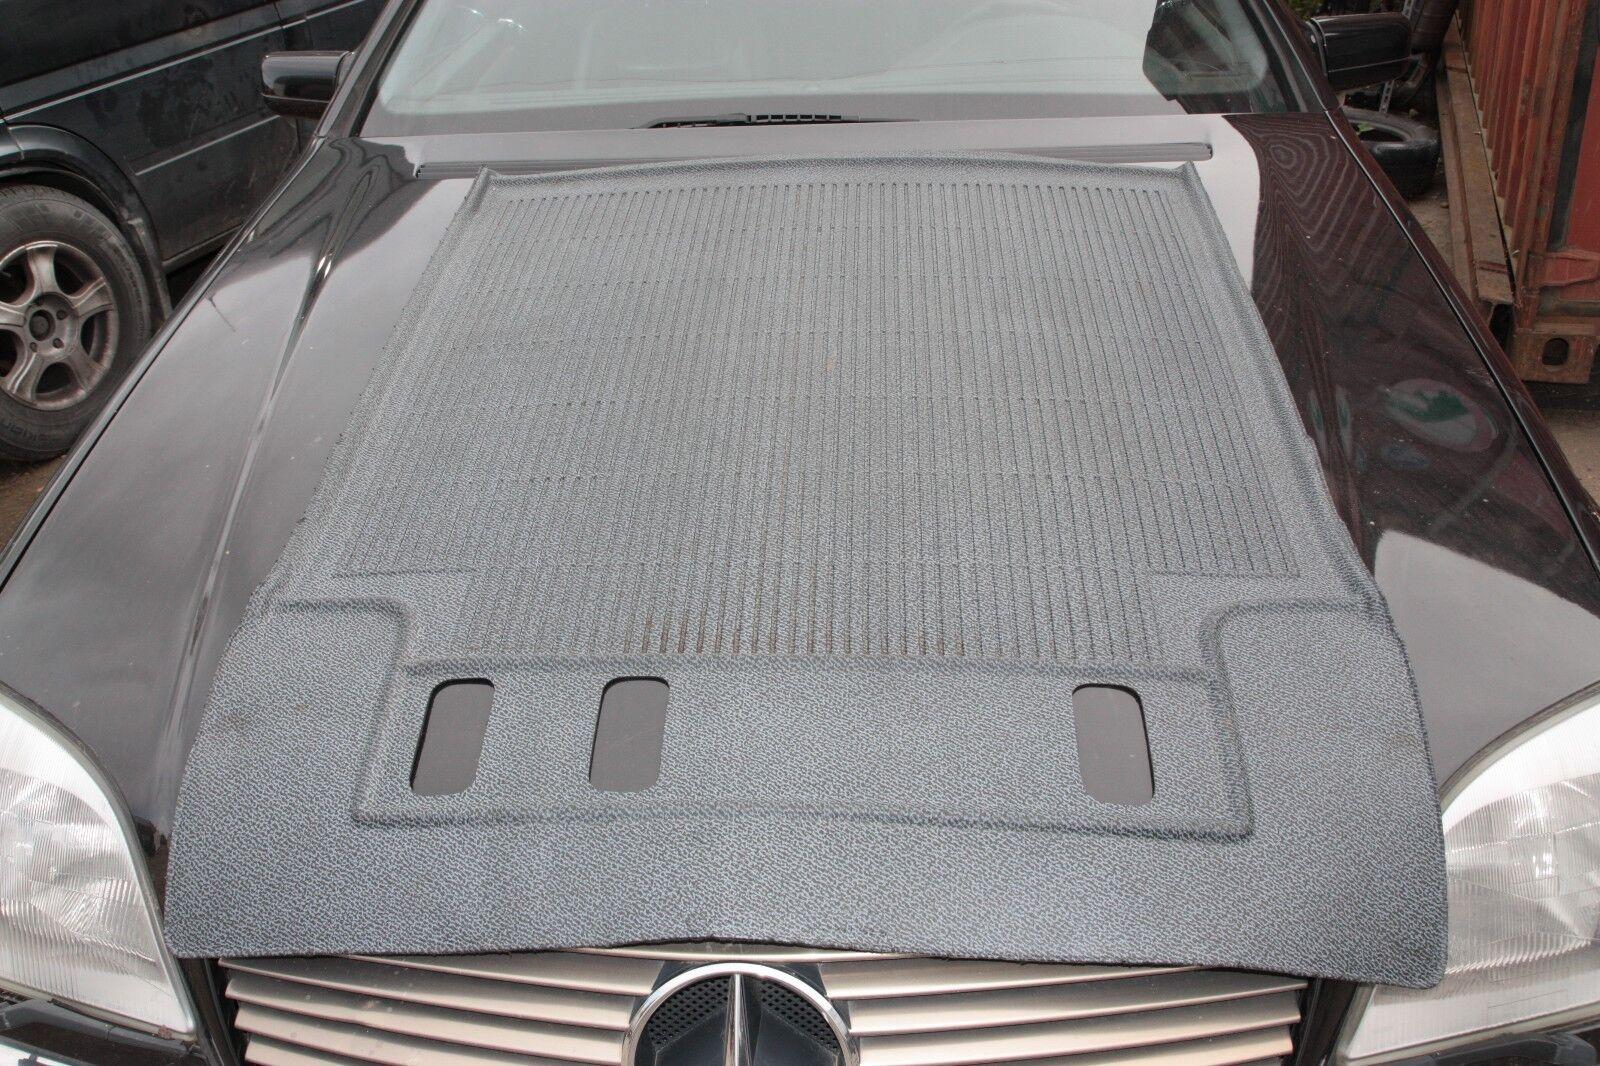 Mercedes-Benz Rubber Trunk voiturego Protector Mat  W463 Lwb A4636840105